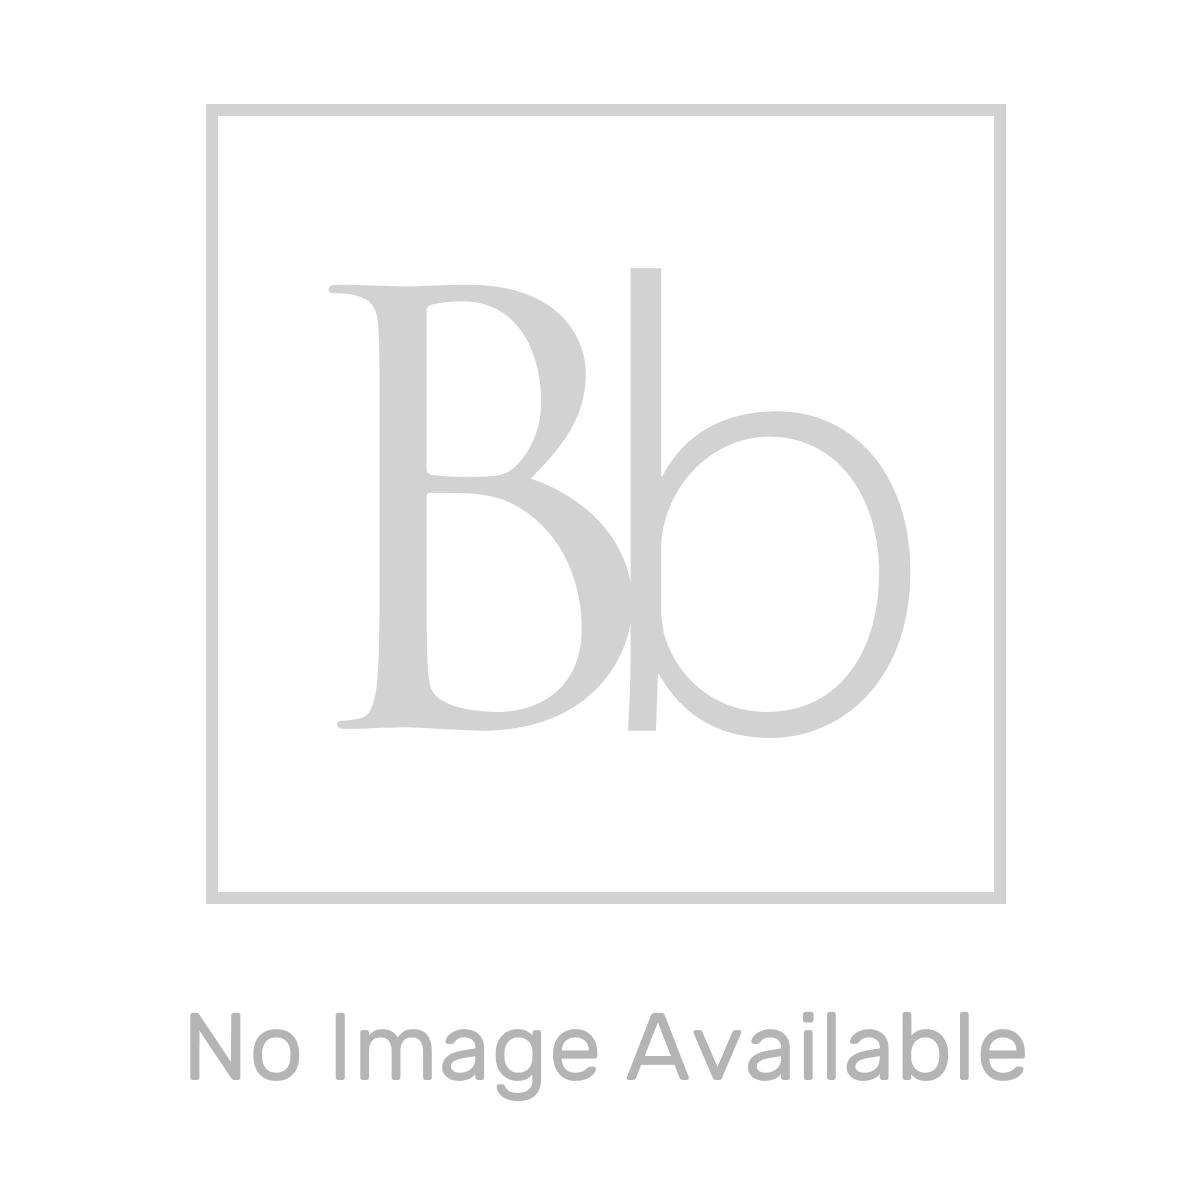 RAK Feeling Grey Rectangular Shower Tray 1700 x 700mm Measurements